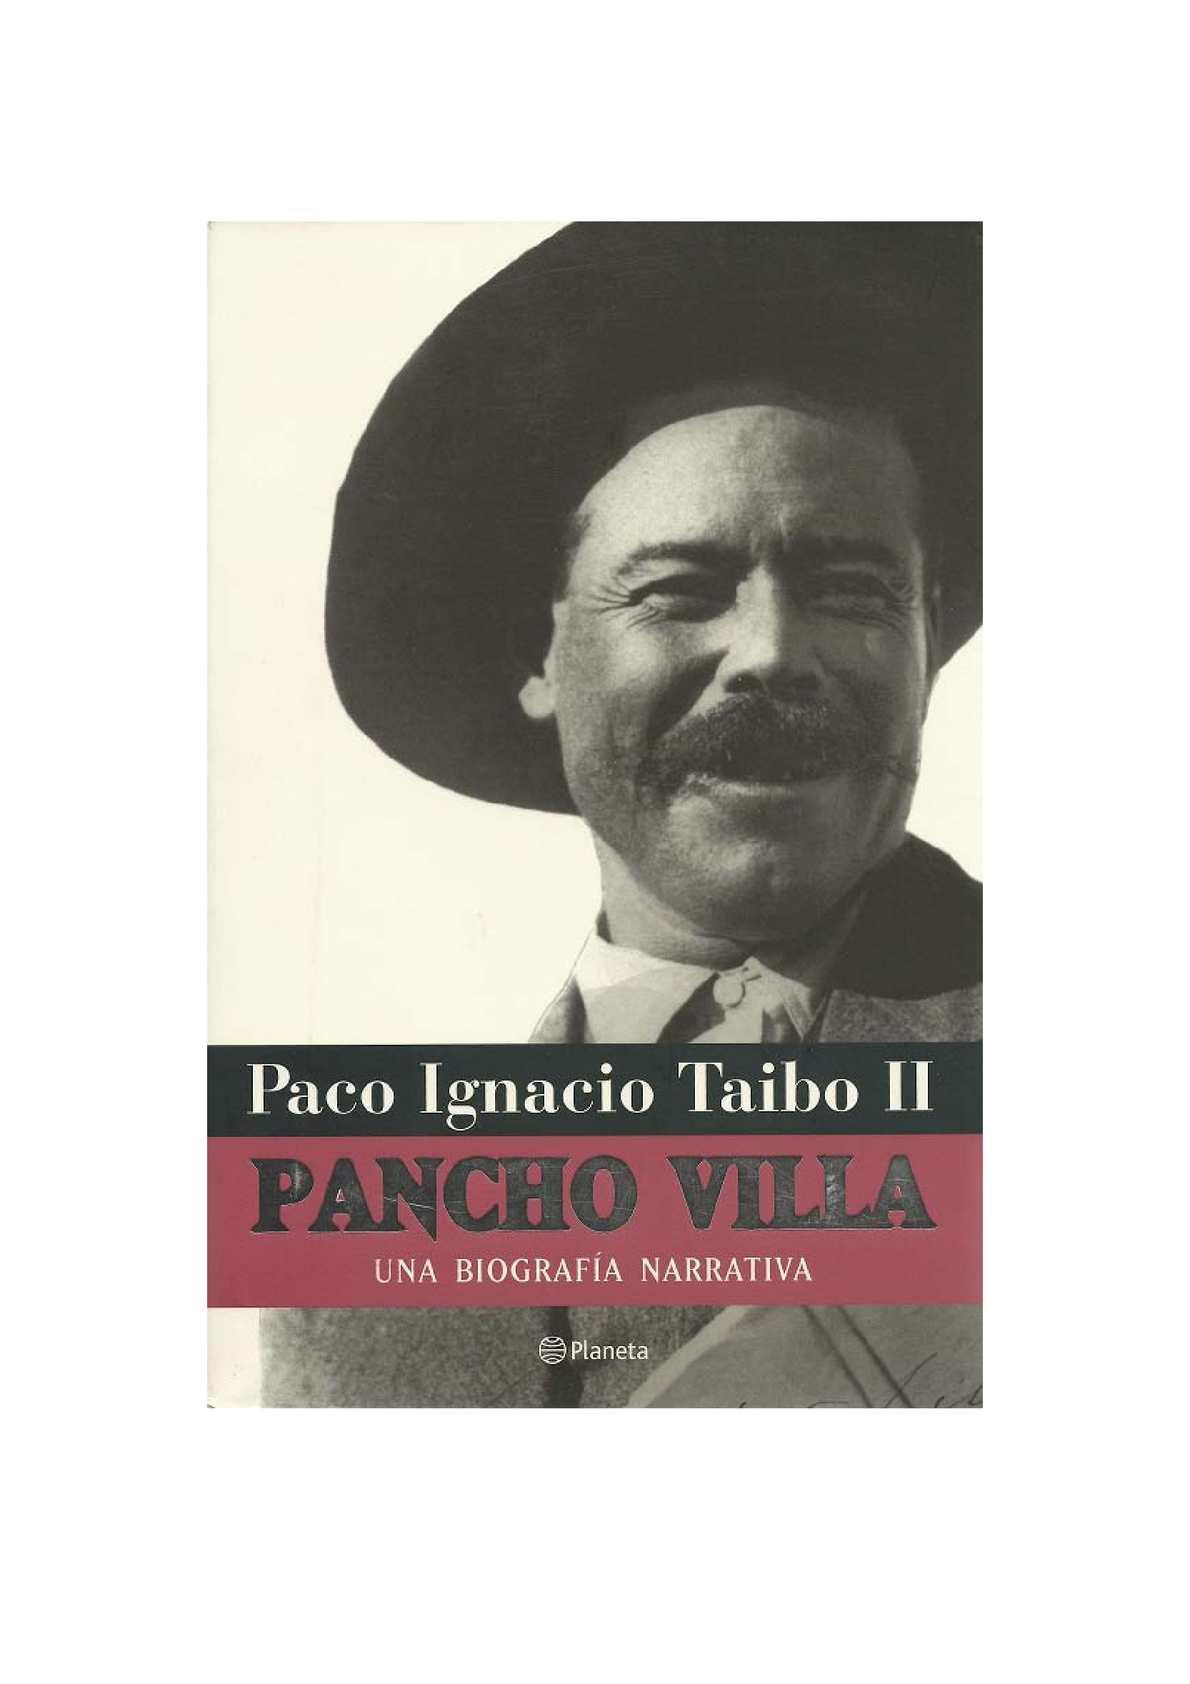 ddc8ae1f0ee6e Calaméo - Pancho Villa -Paco Ignacio Taibo II